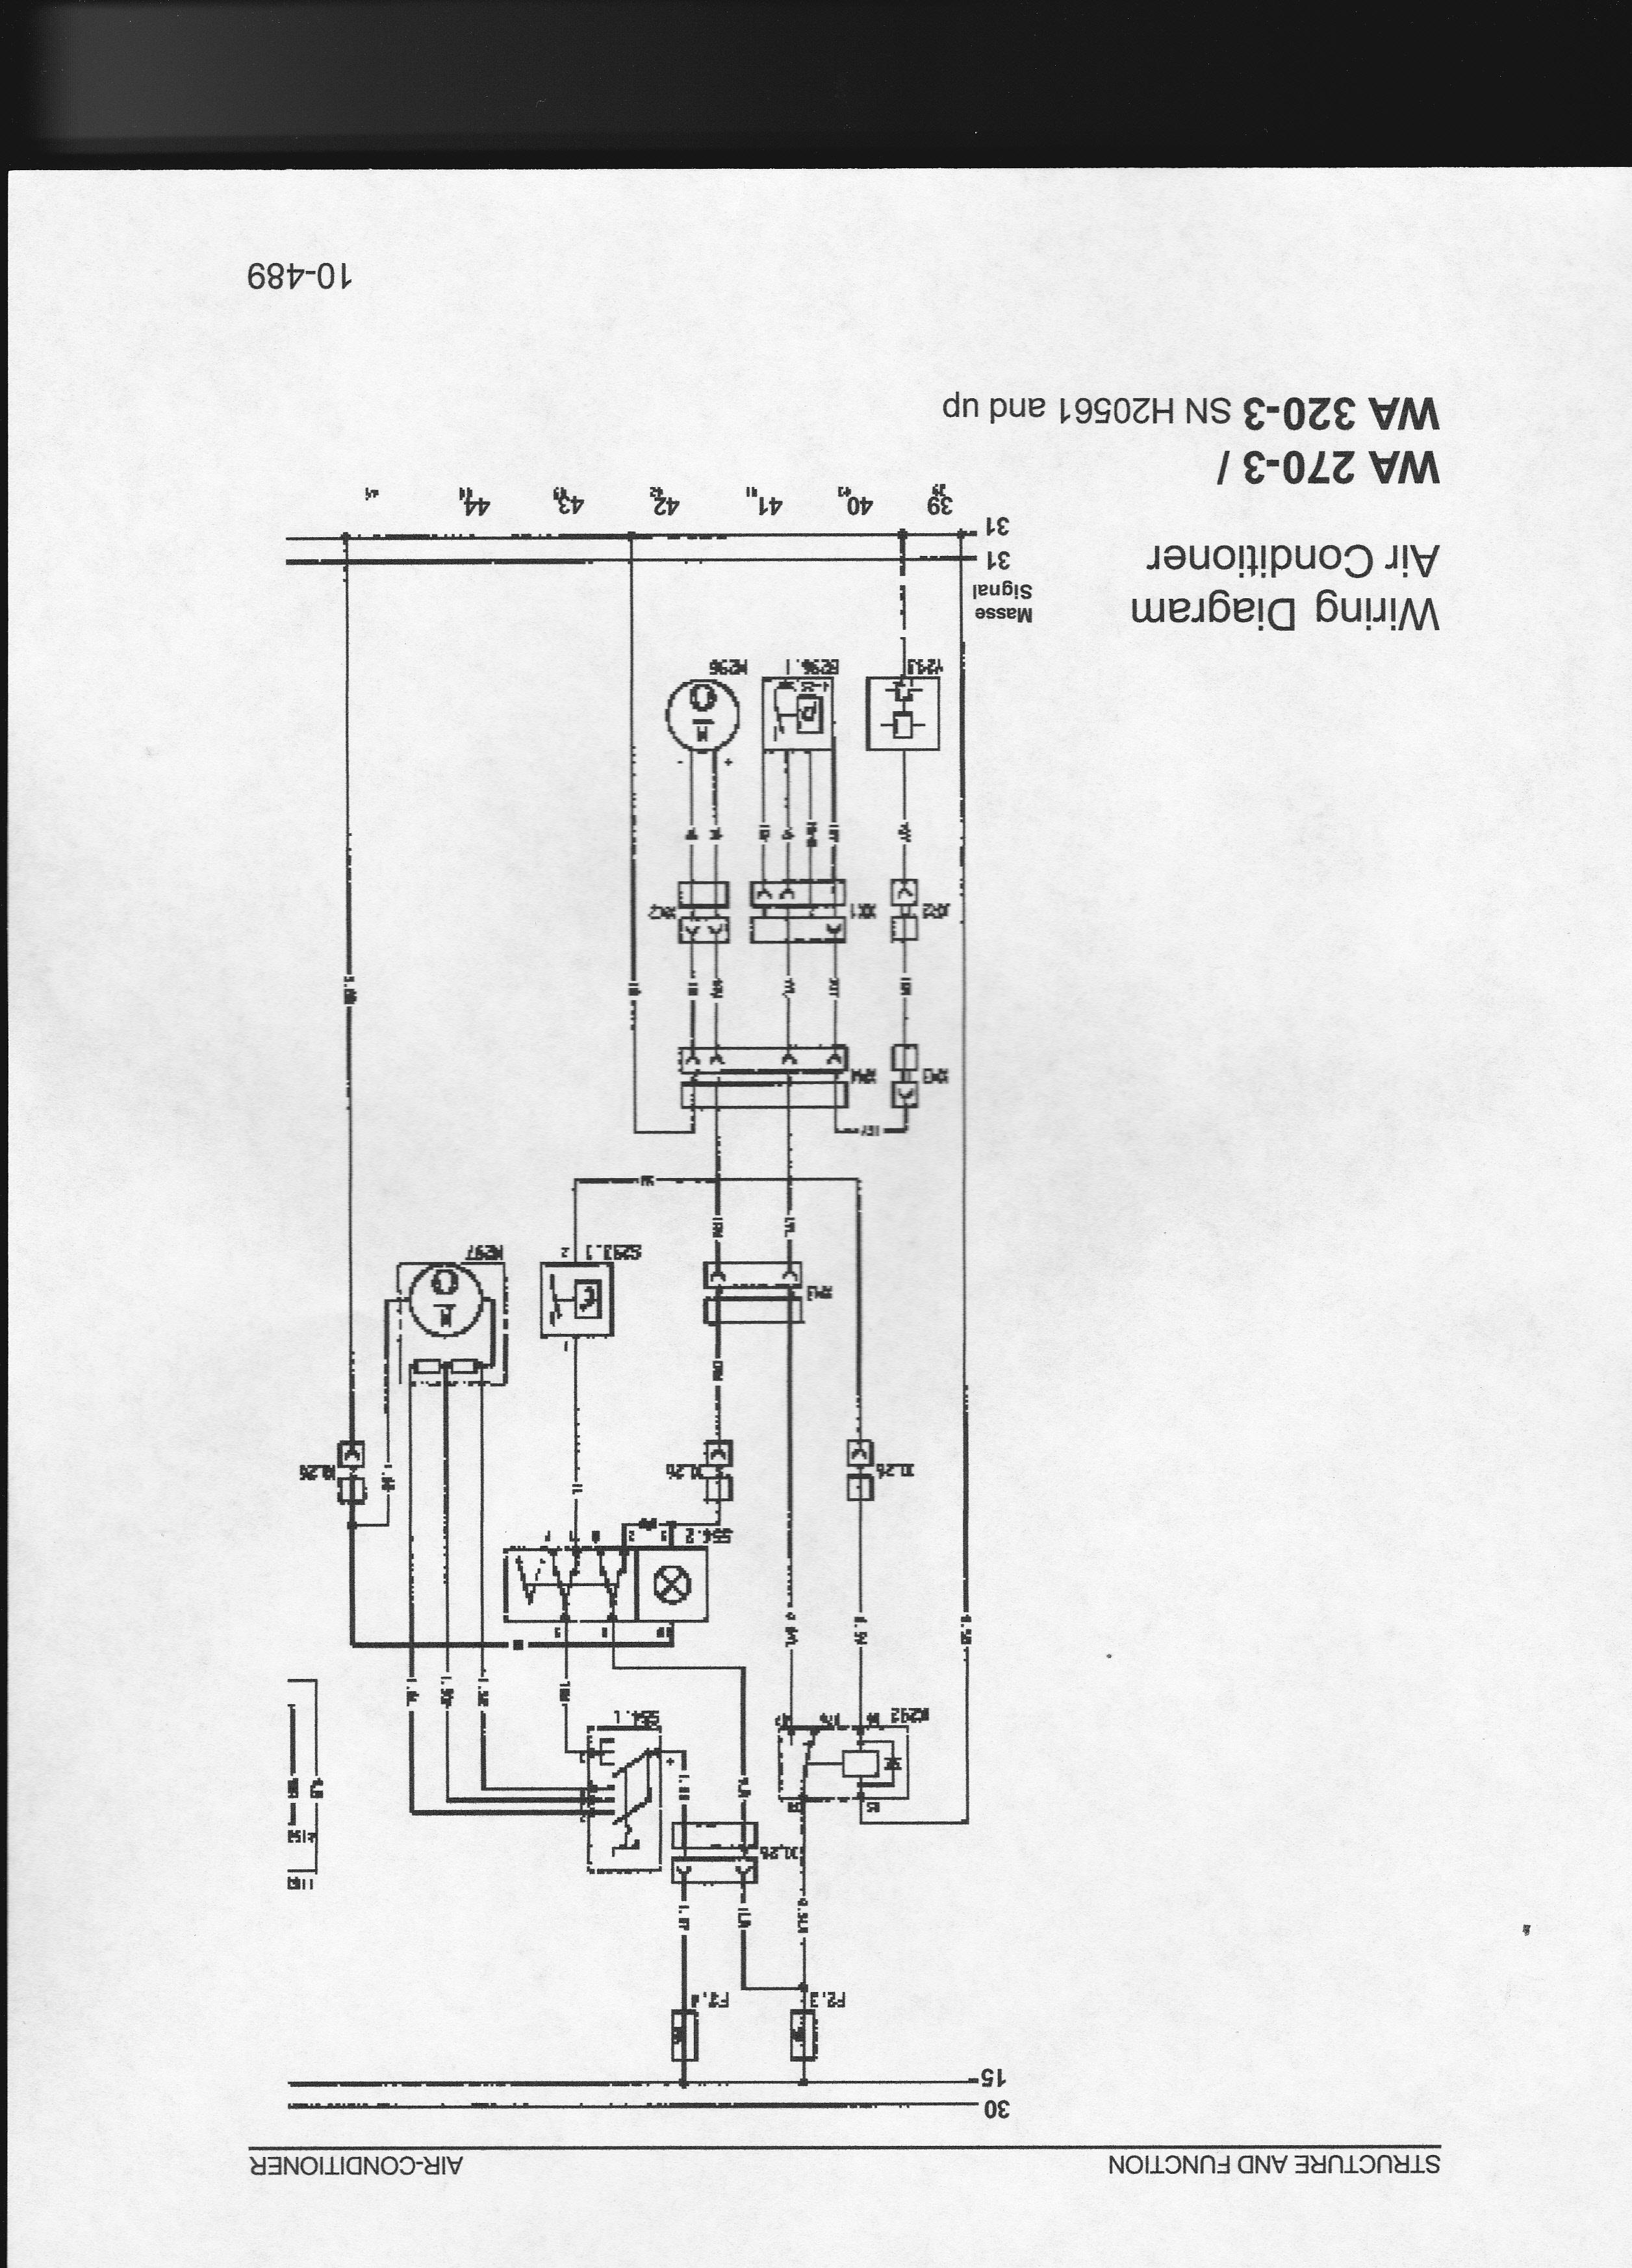 Vehicle komatsu wa420 h 30383 quarry loading shovel uk based graphic graphic graphic swarovskicordoba Image collections